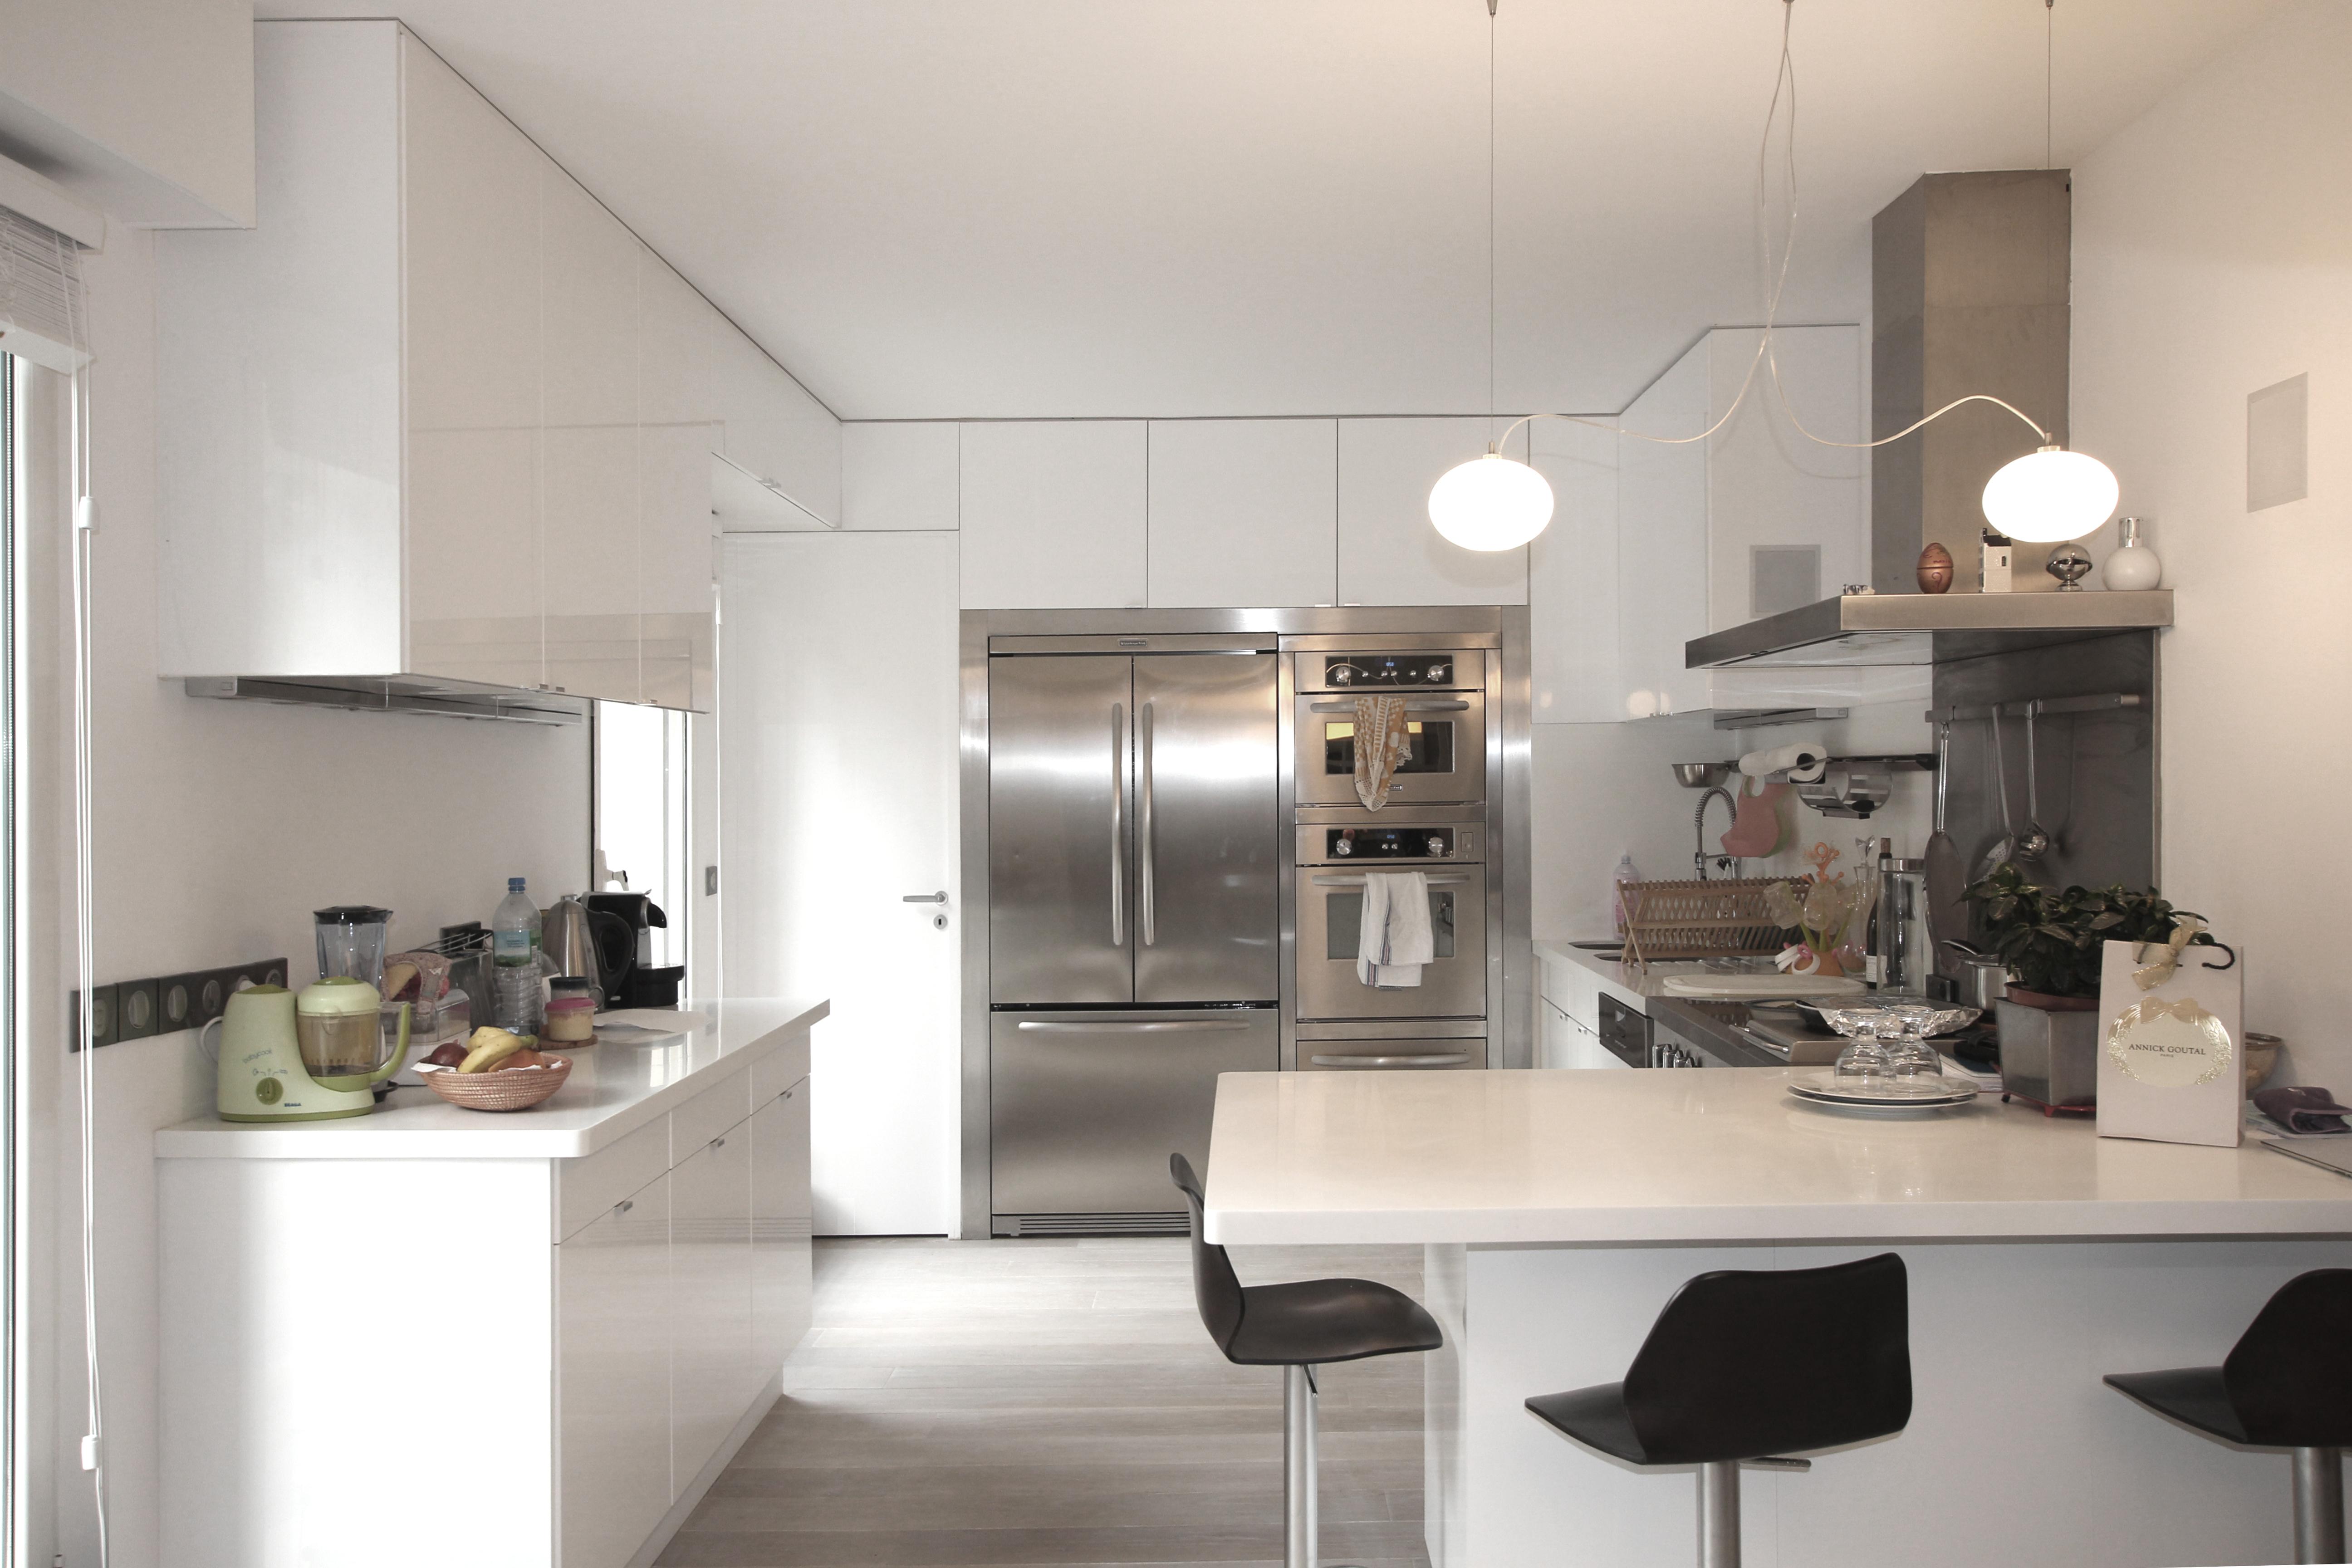 vue g n rale de la cuisine. Black Bedroom Furniture Sets. Home Design Ideas